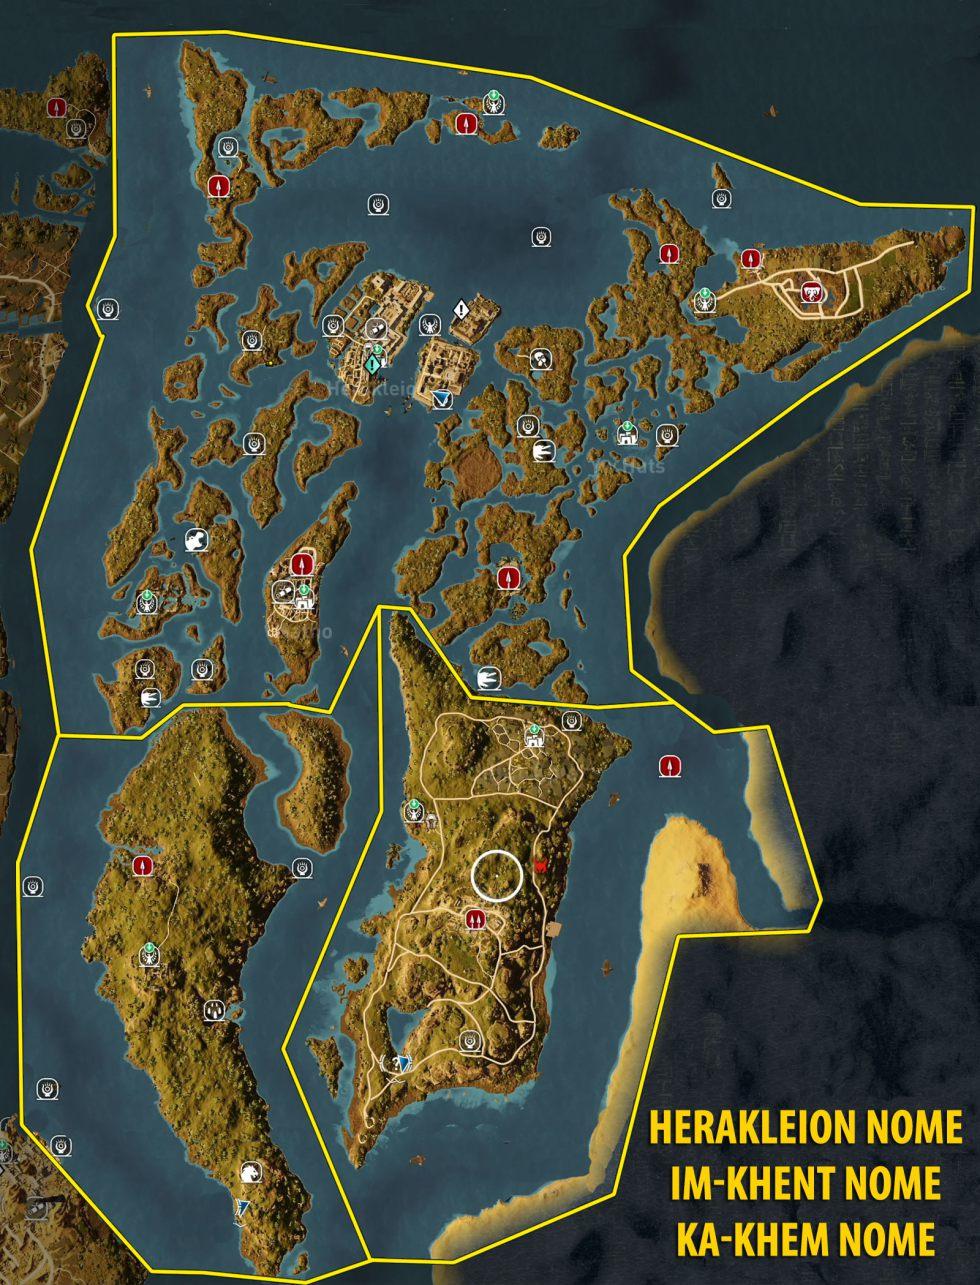 Assassin's Creed Origins Stone Circles Map : assassin's, creed, origins, stone, circles, Herakleion, Nome,, In-Khent, Ka-Khem, Tombs,, Papyrus, Puzzles, Secrets, Assassin's, Creed, Origins, Guide, Gamepressure.com